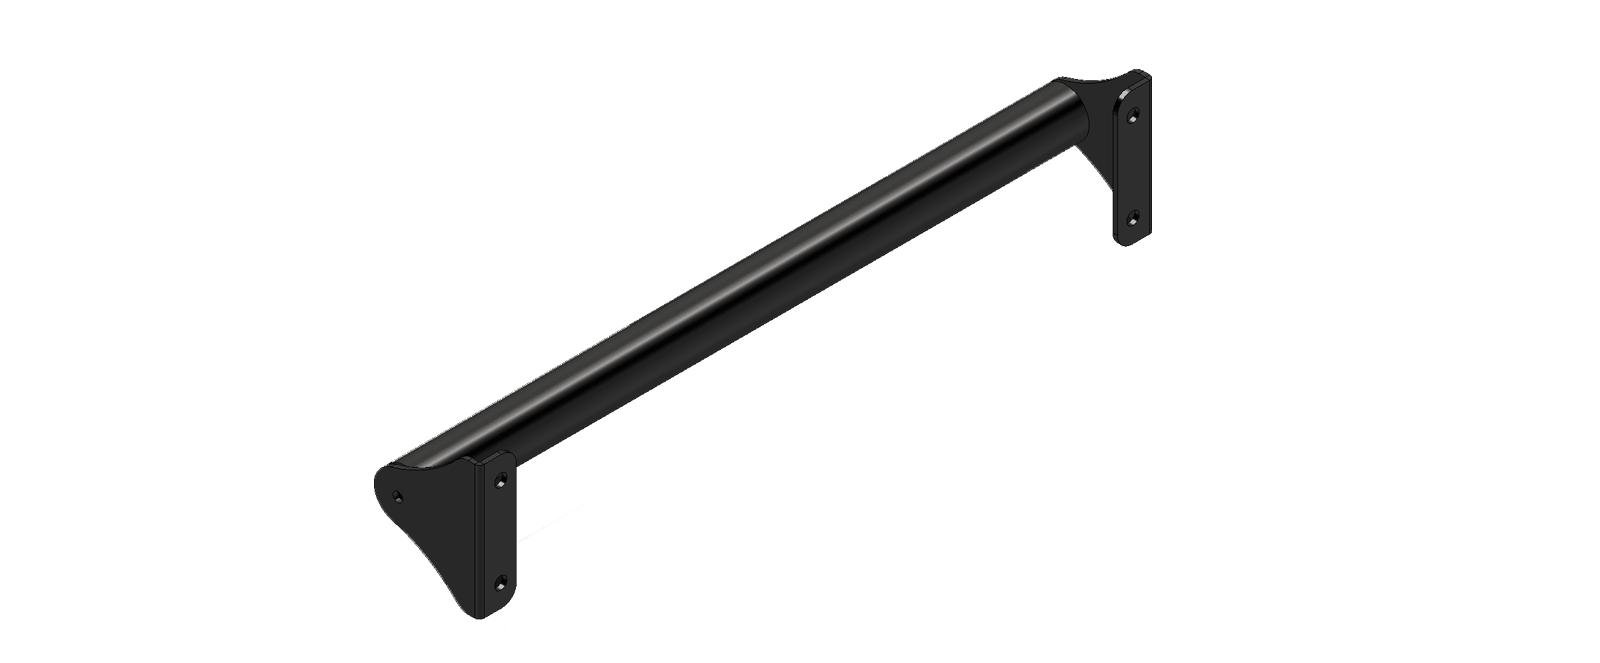 slim_handle_kit_parts.png